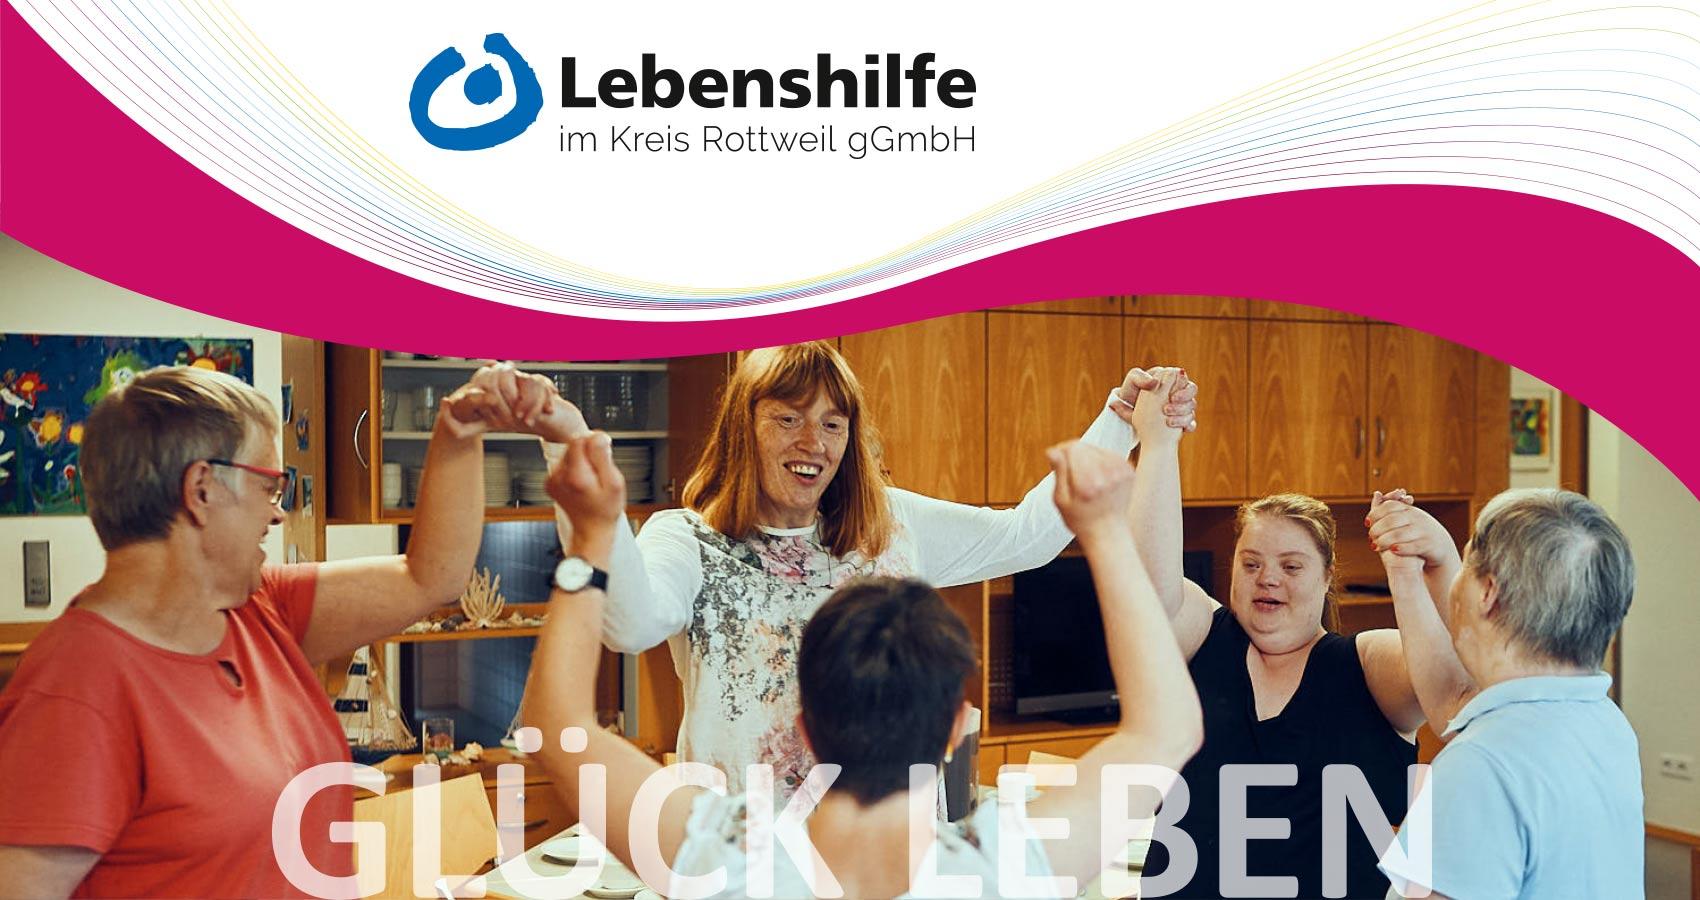 Lebenshilfe im Kreis Rottweil gGmbH - Wohnangebote